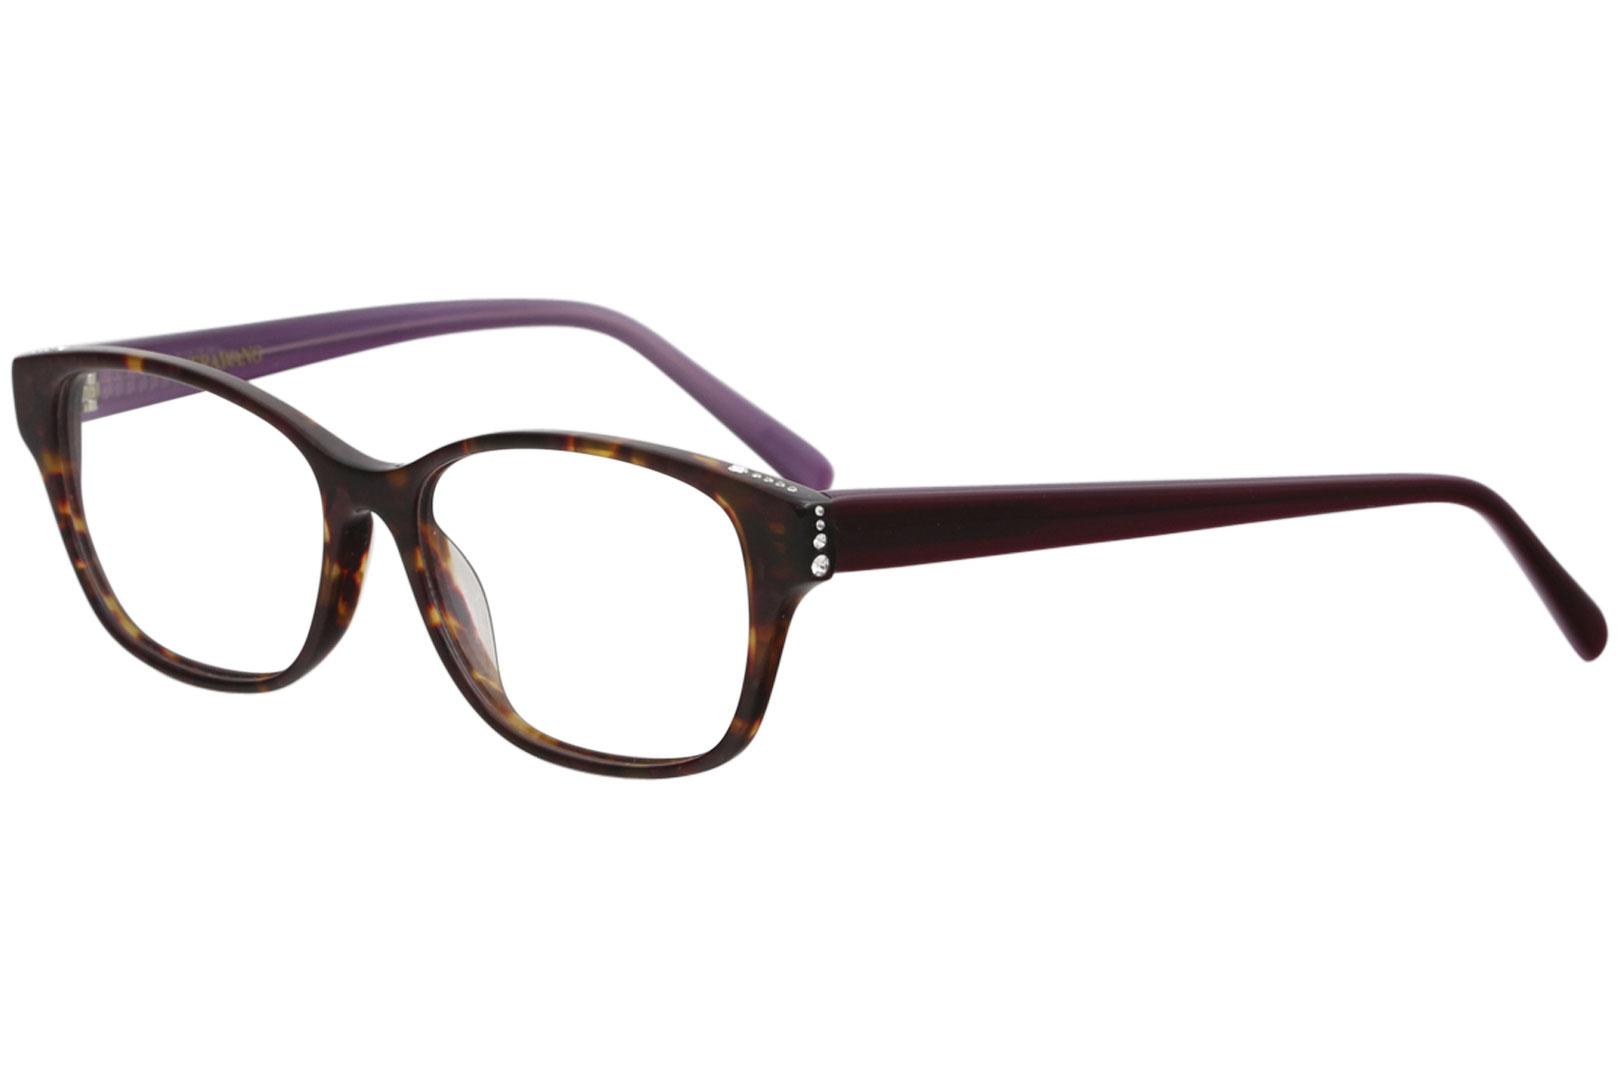 VERA WANG Eyeglasses ELGANTINE Tortoise 52MM